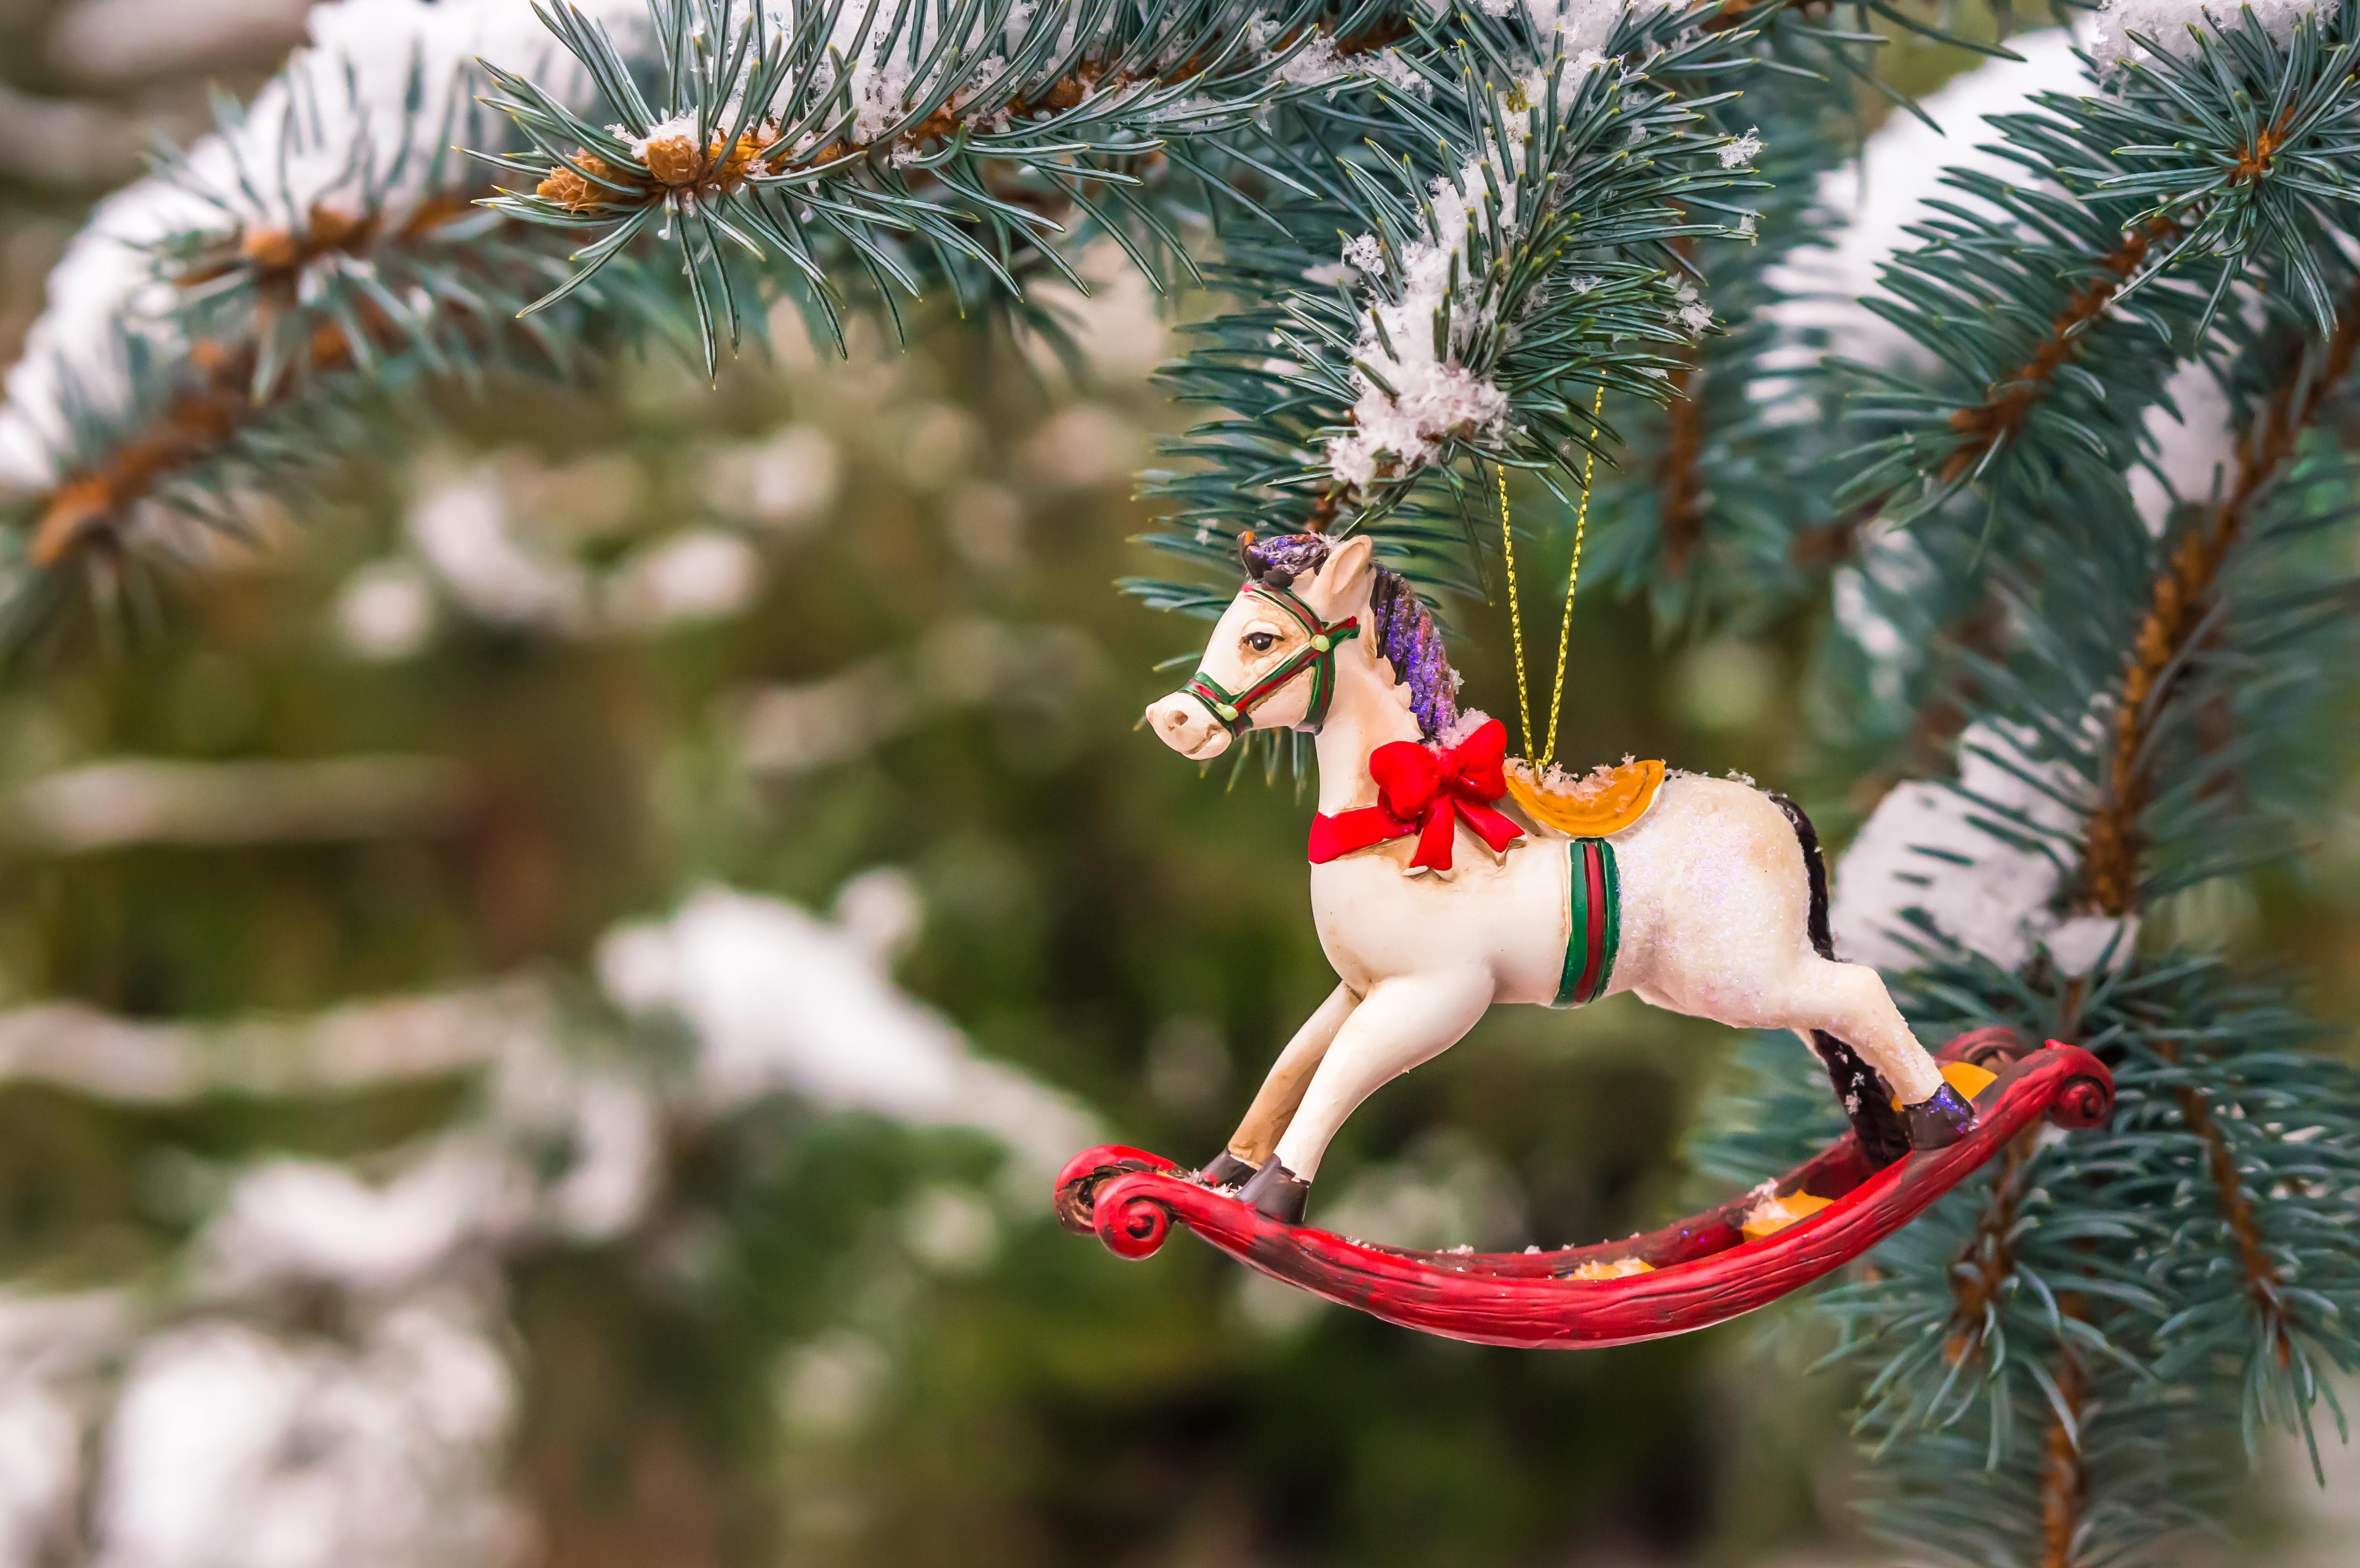 toy-ornament-christmas-crafting.jpg